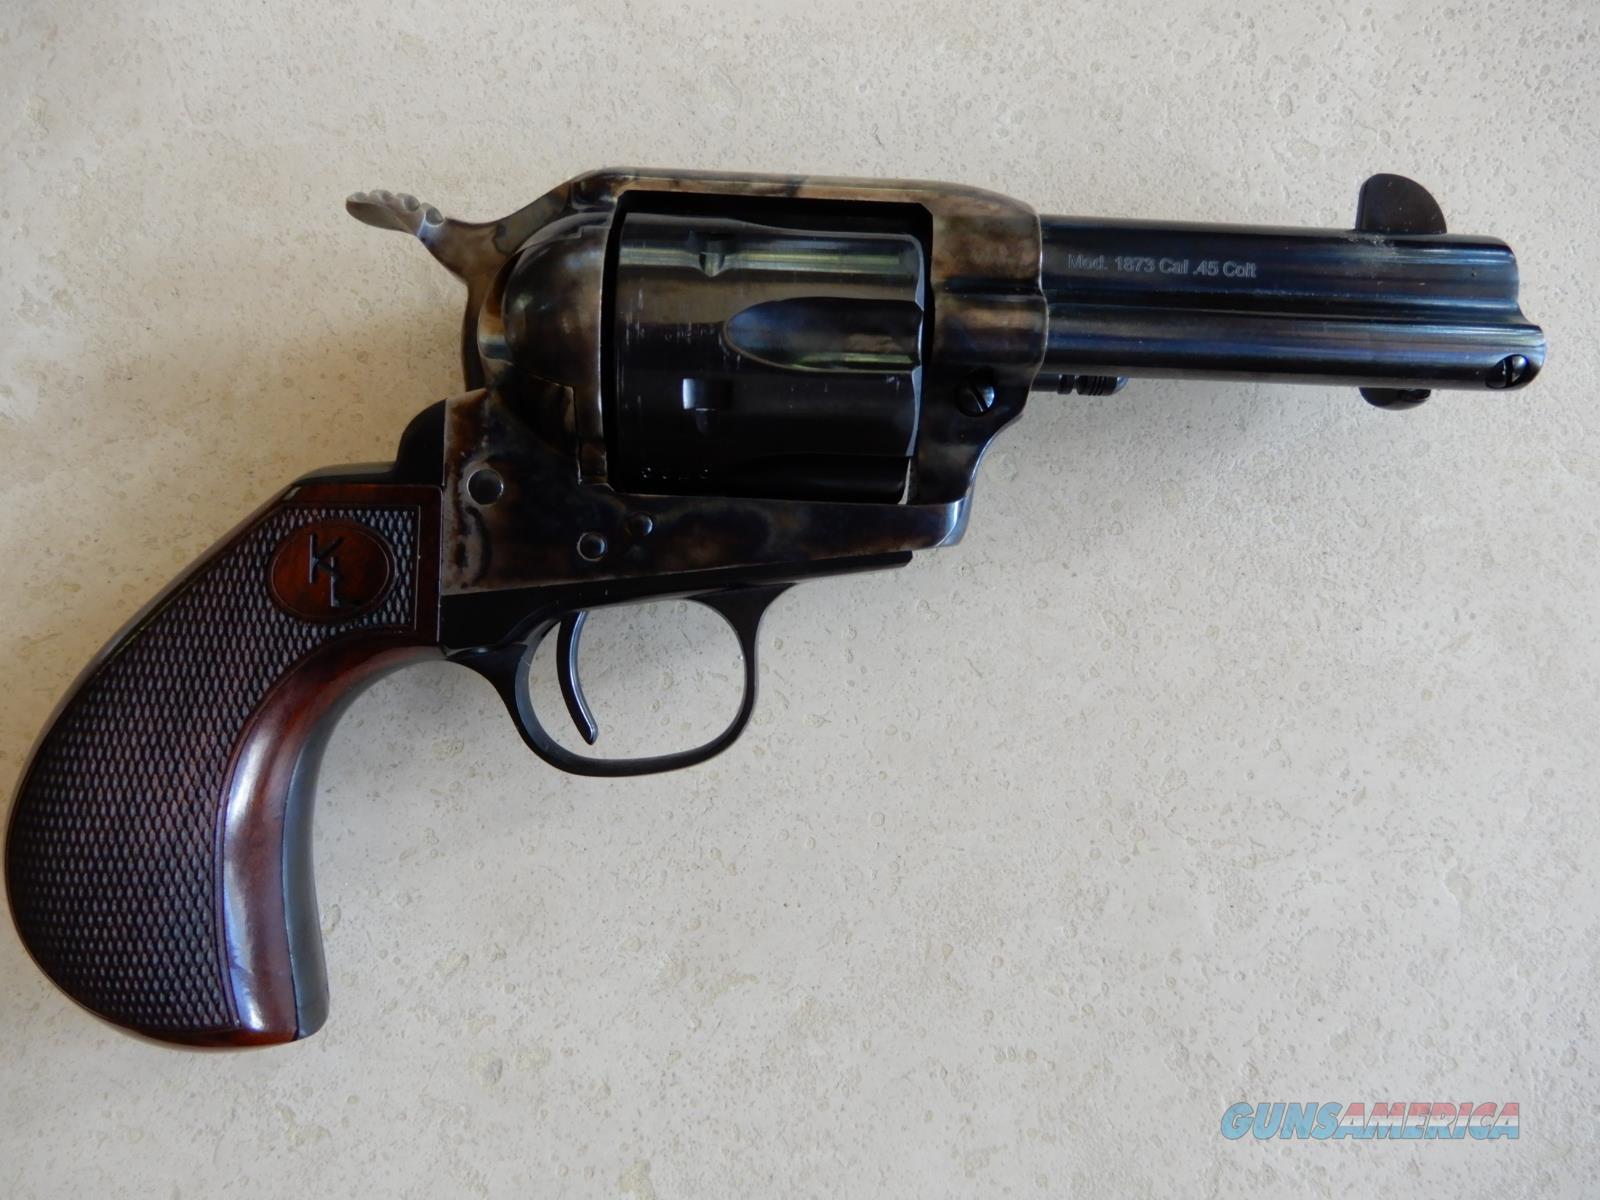 Uberti Short Stroke KL CMS Pro  Guns > Pistols > Uberti Pistols > Ctg.